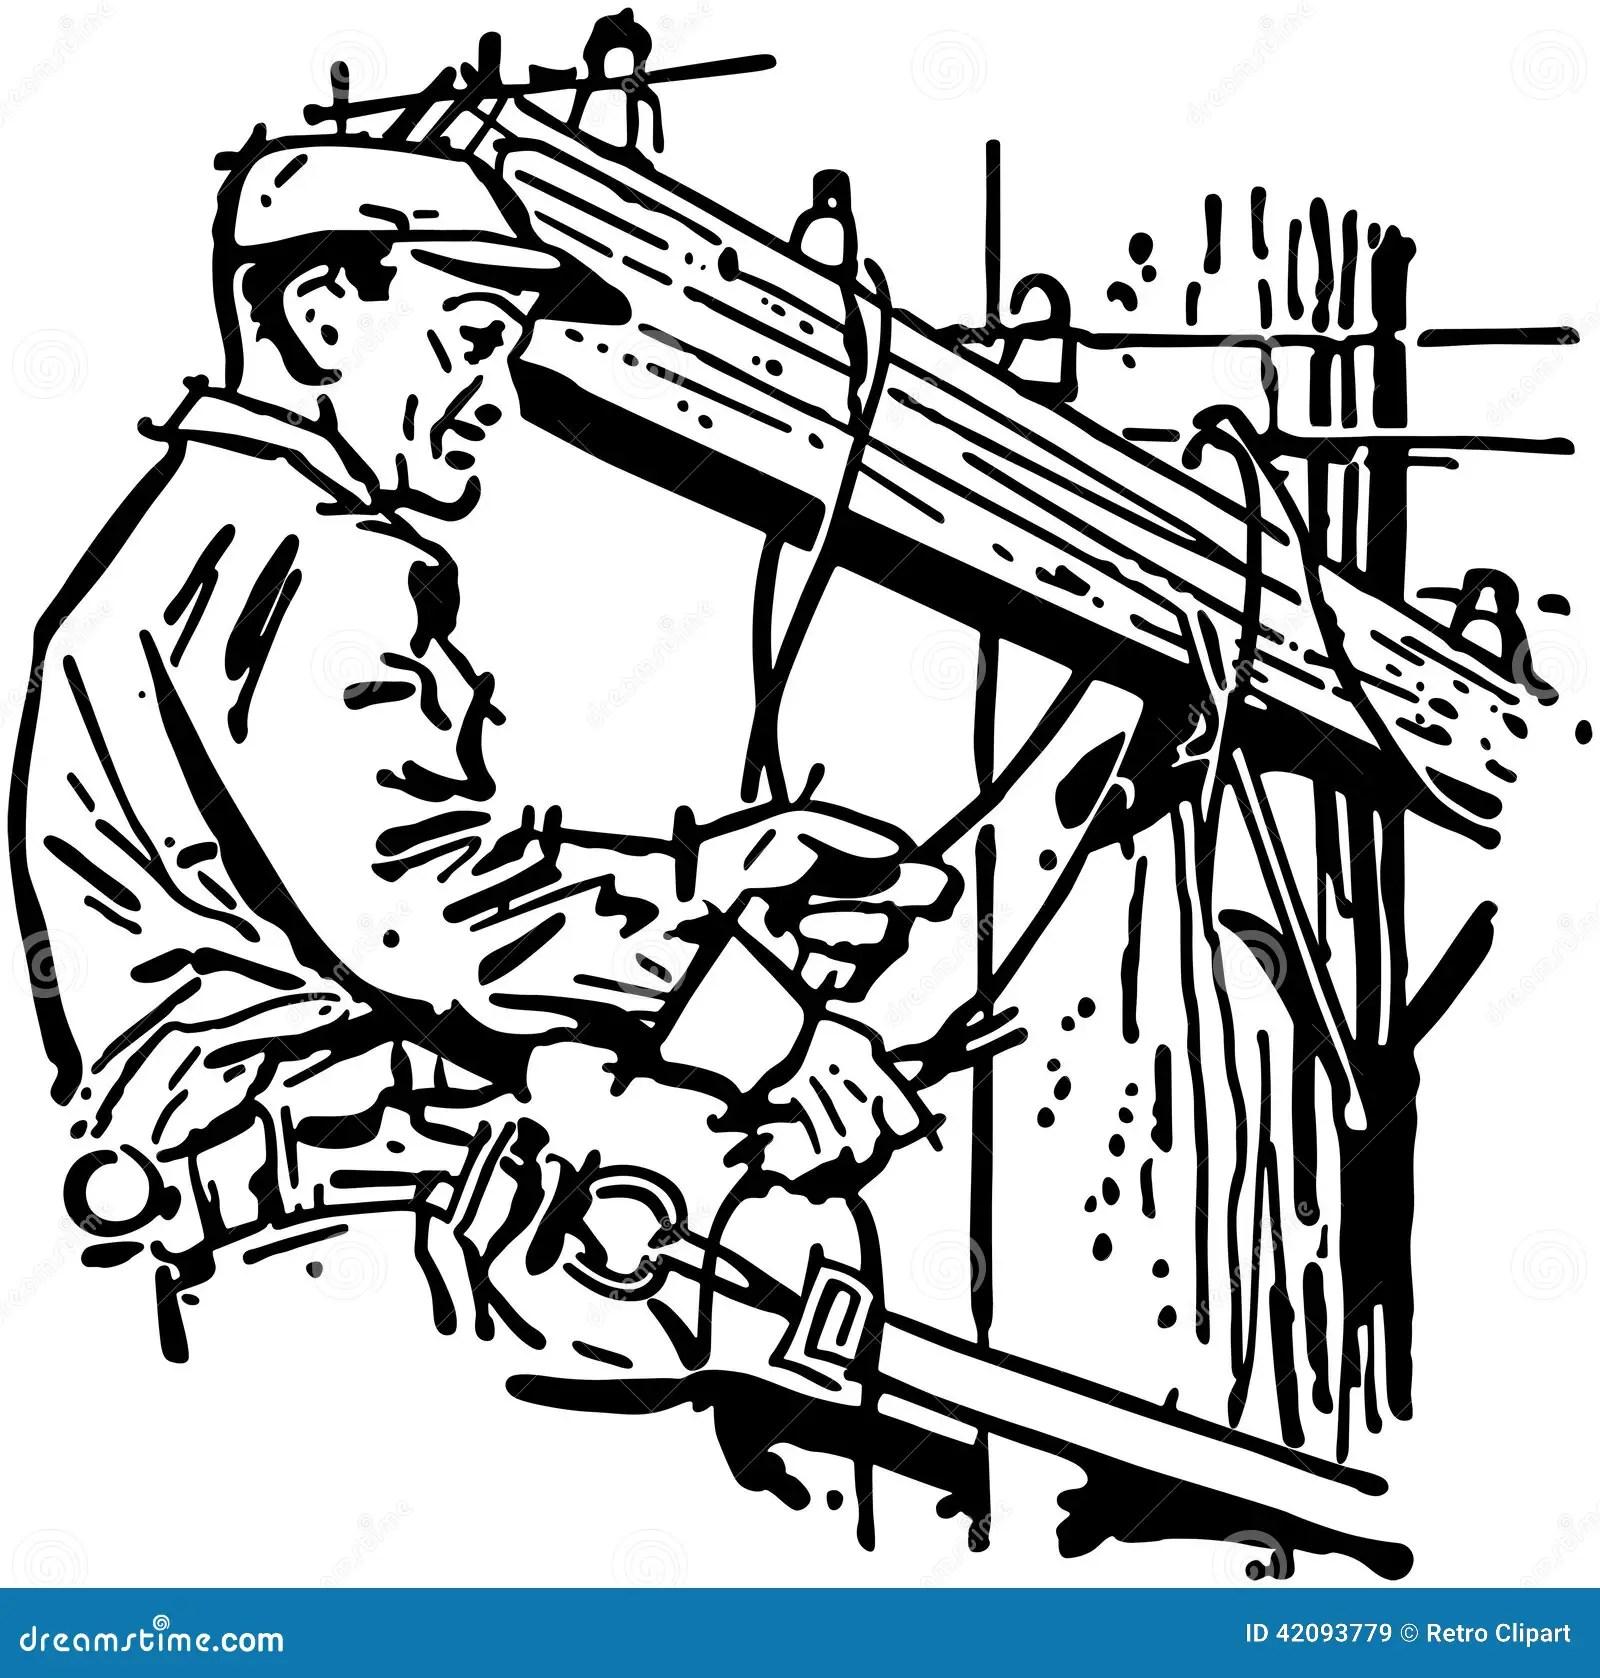 Wichita Cartoons Illustrations Amp Vector Stock Images